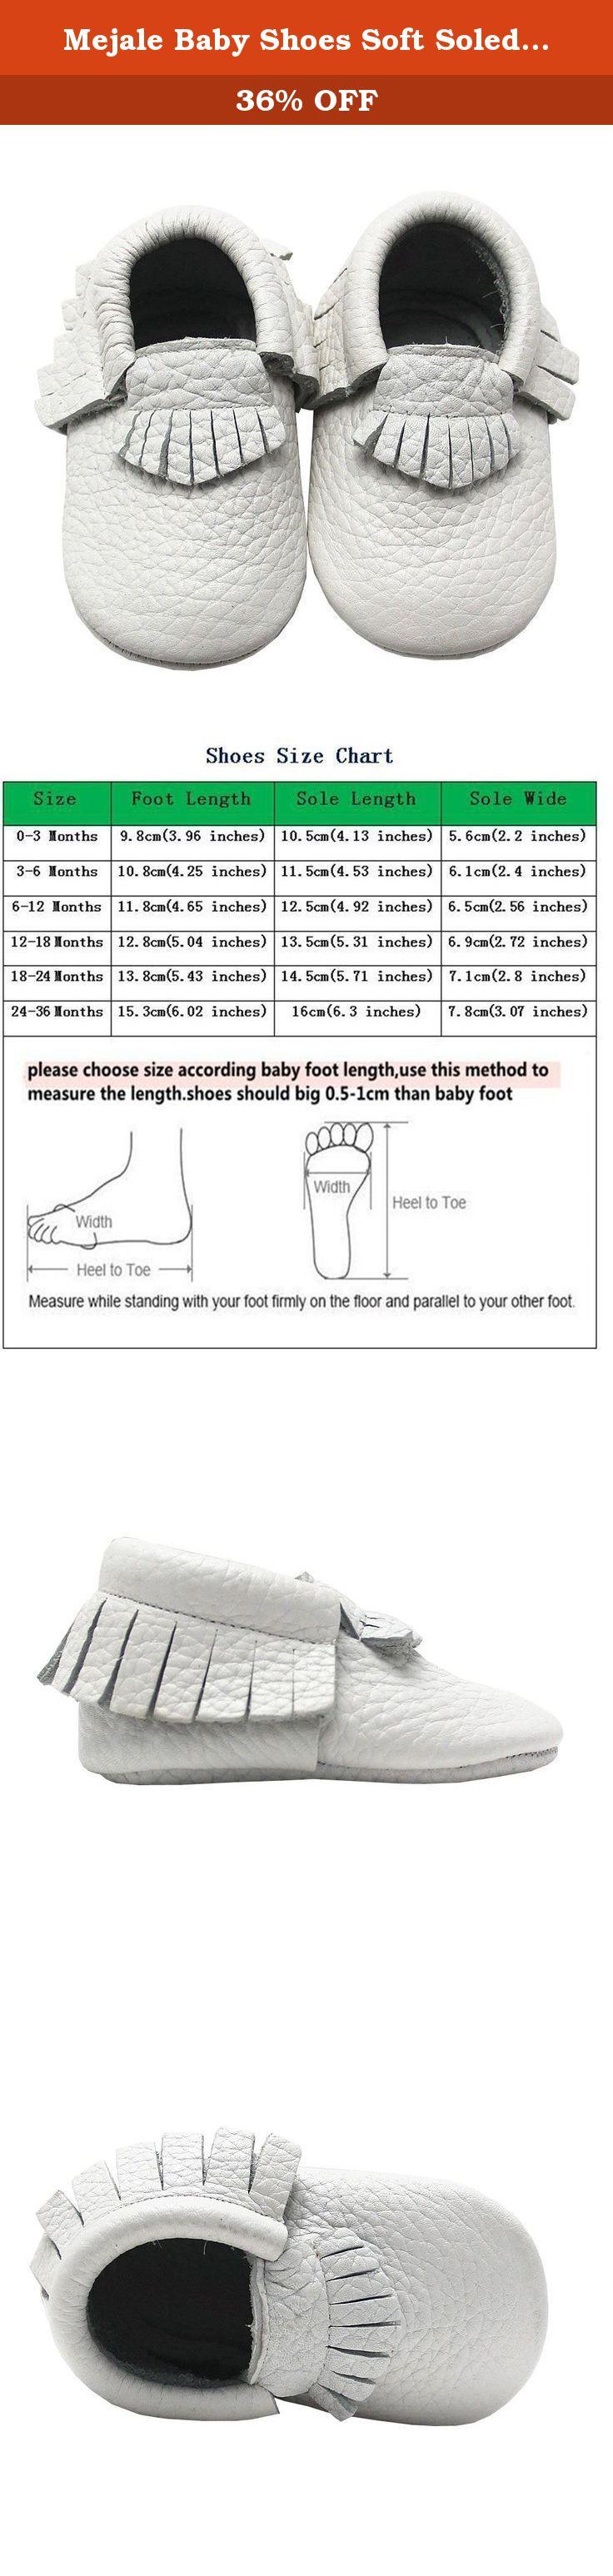 Mejale Baby Shoes Soft Soled Leather Moccasins Slip on Infant